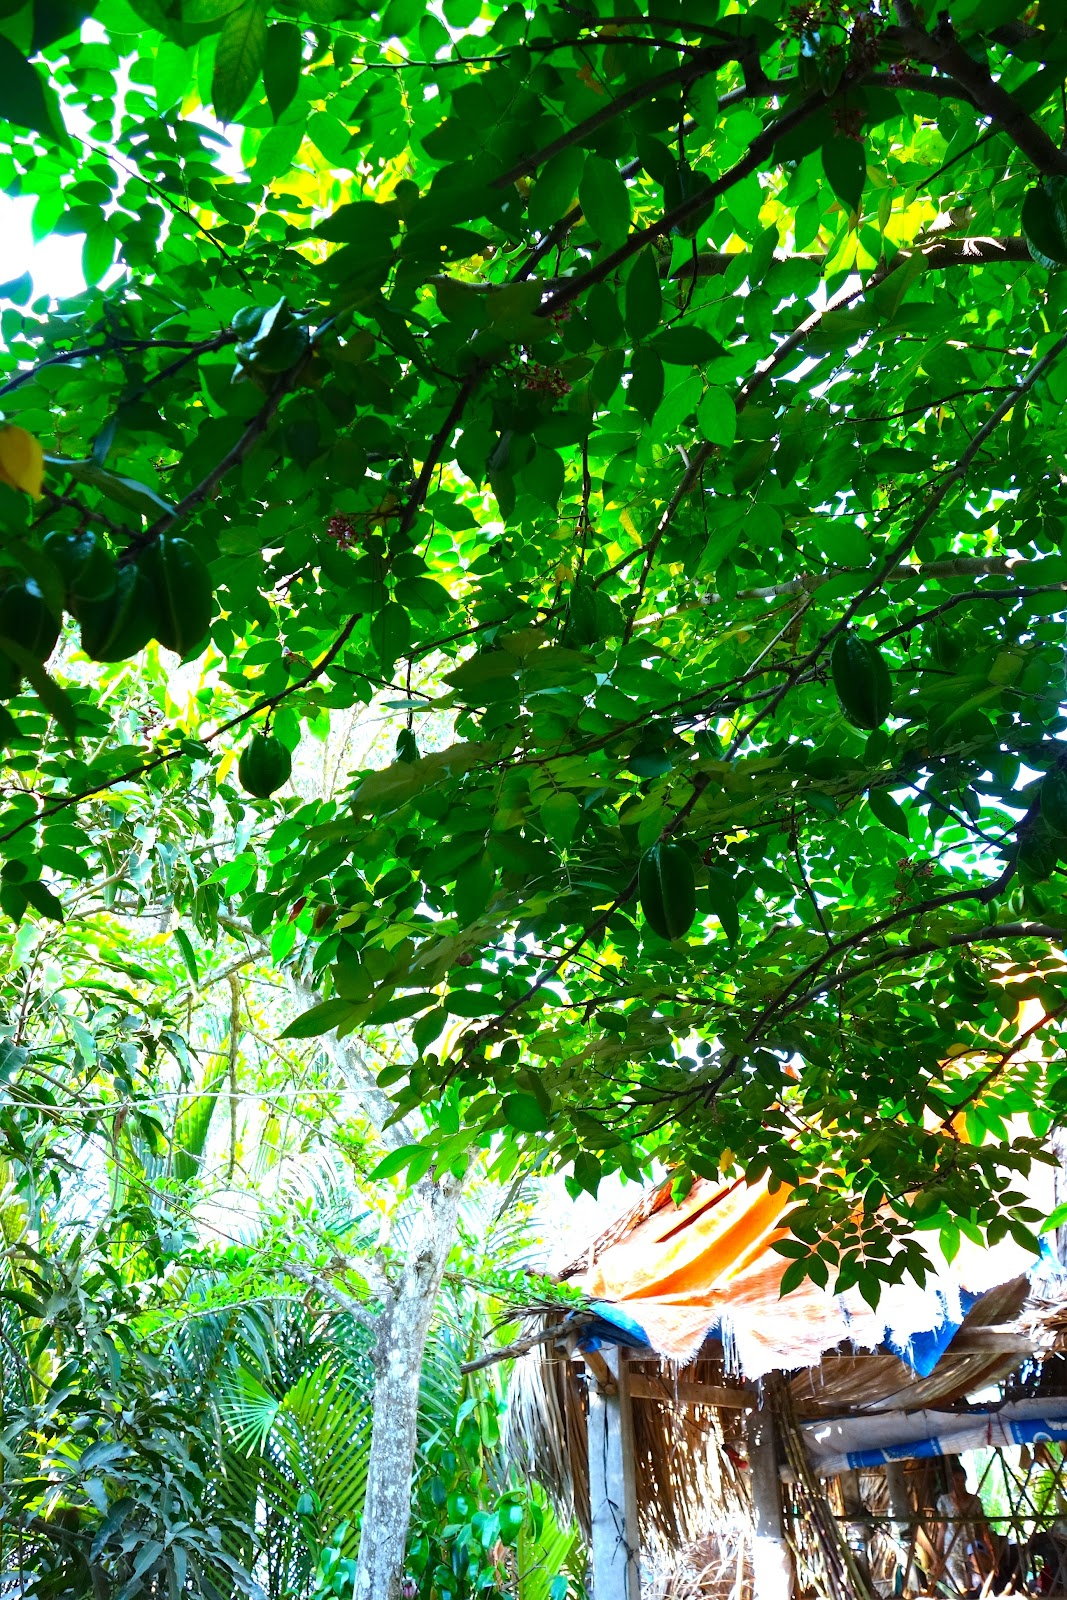 starfruit trees Vietnam 2015